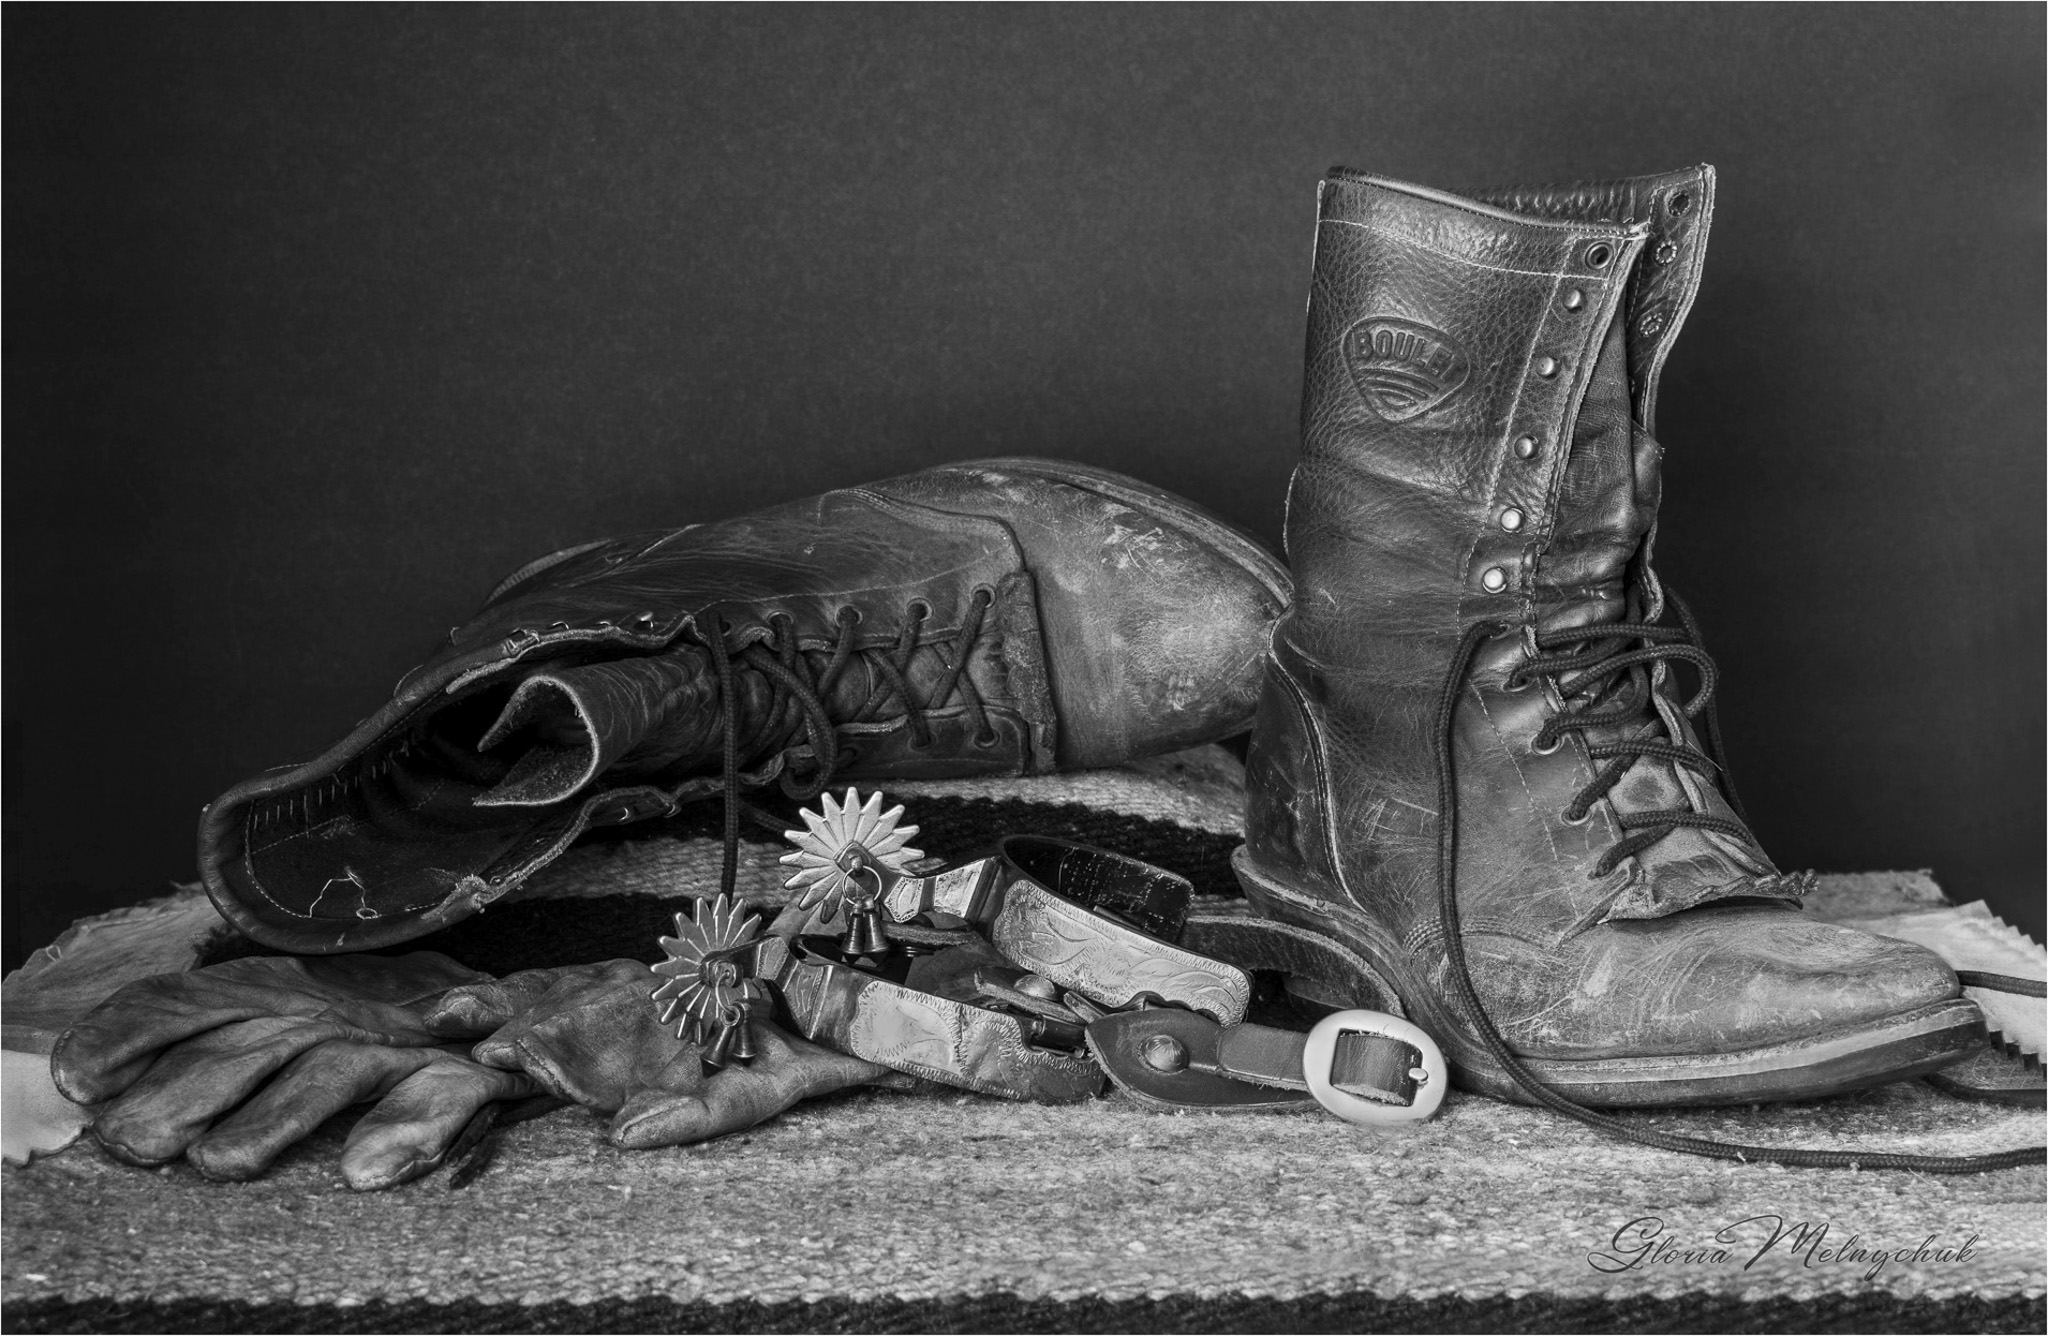 Cowboy Gear © Gloria Melnychuk